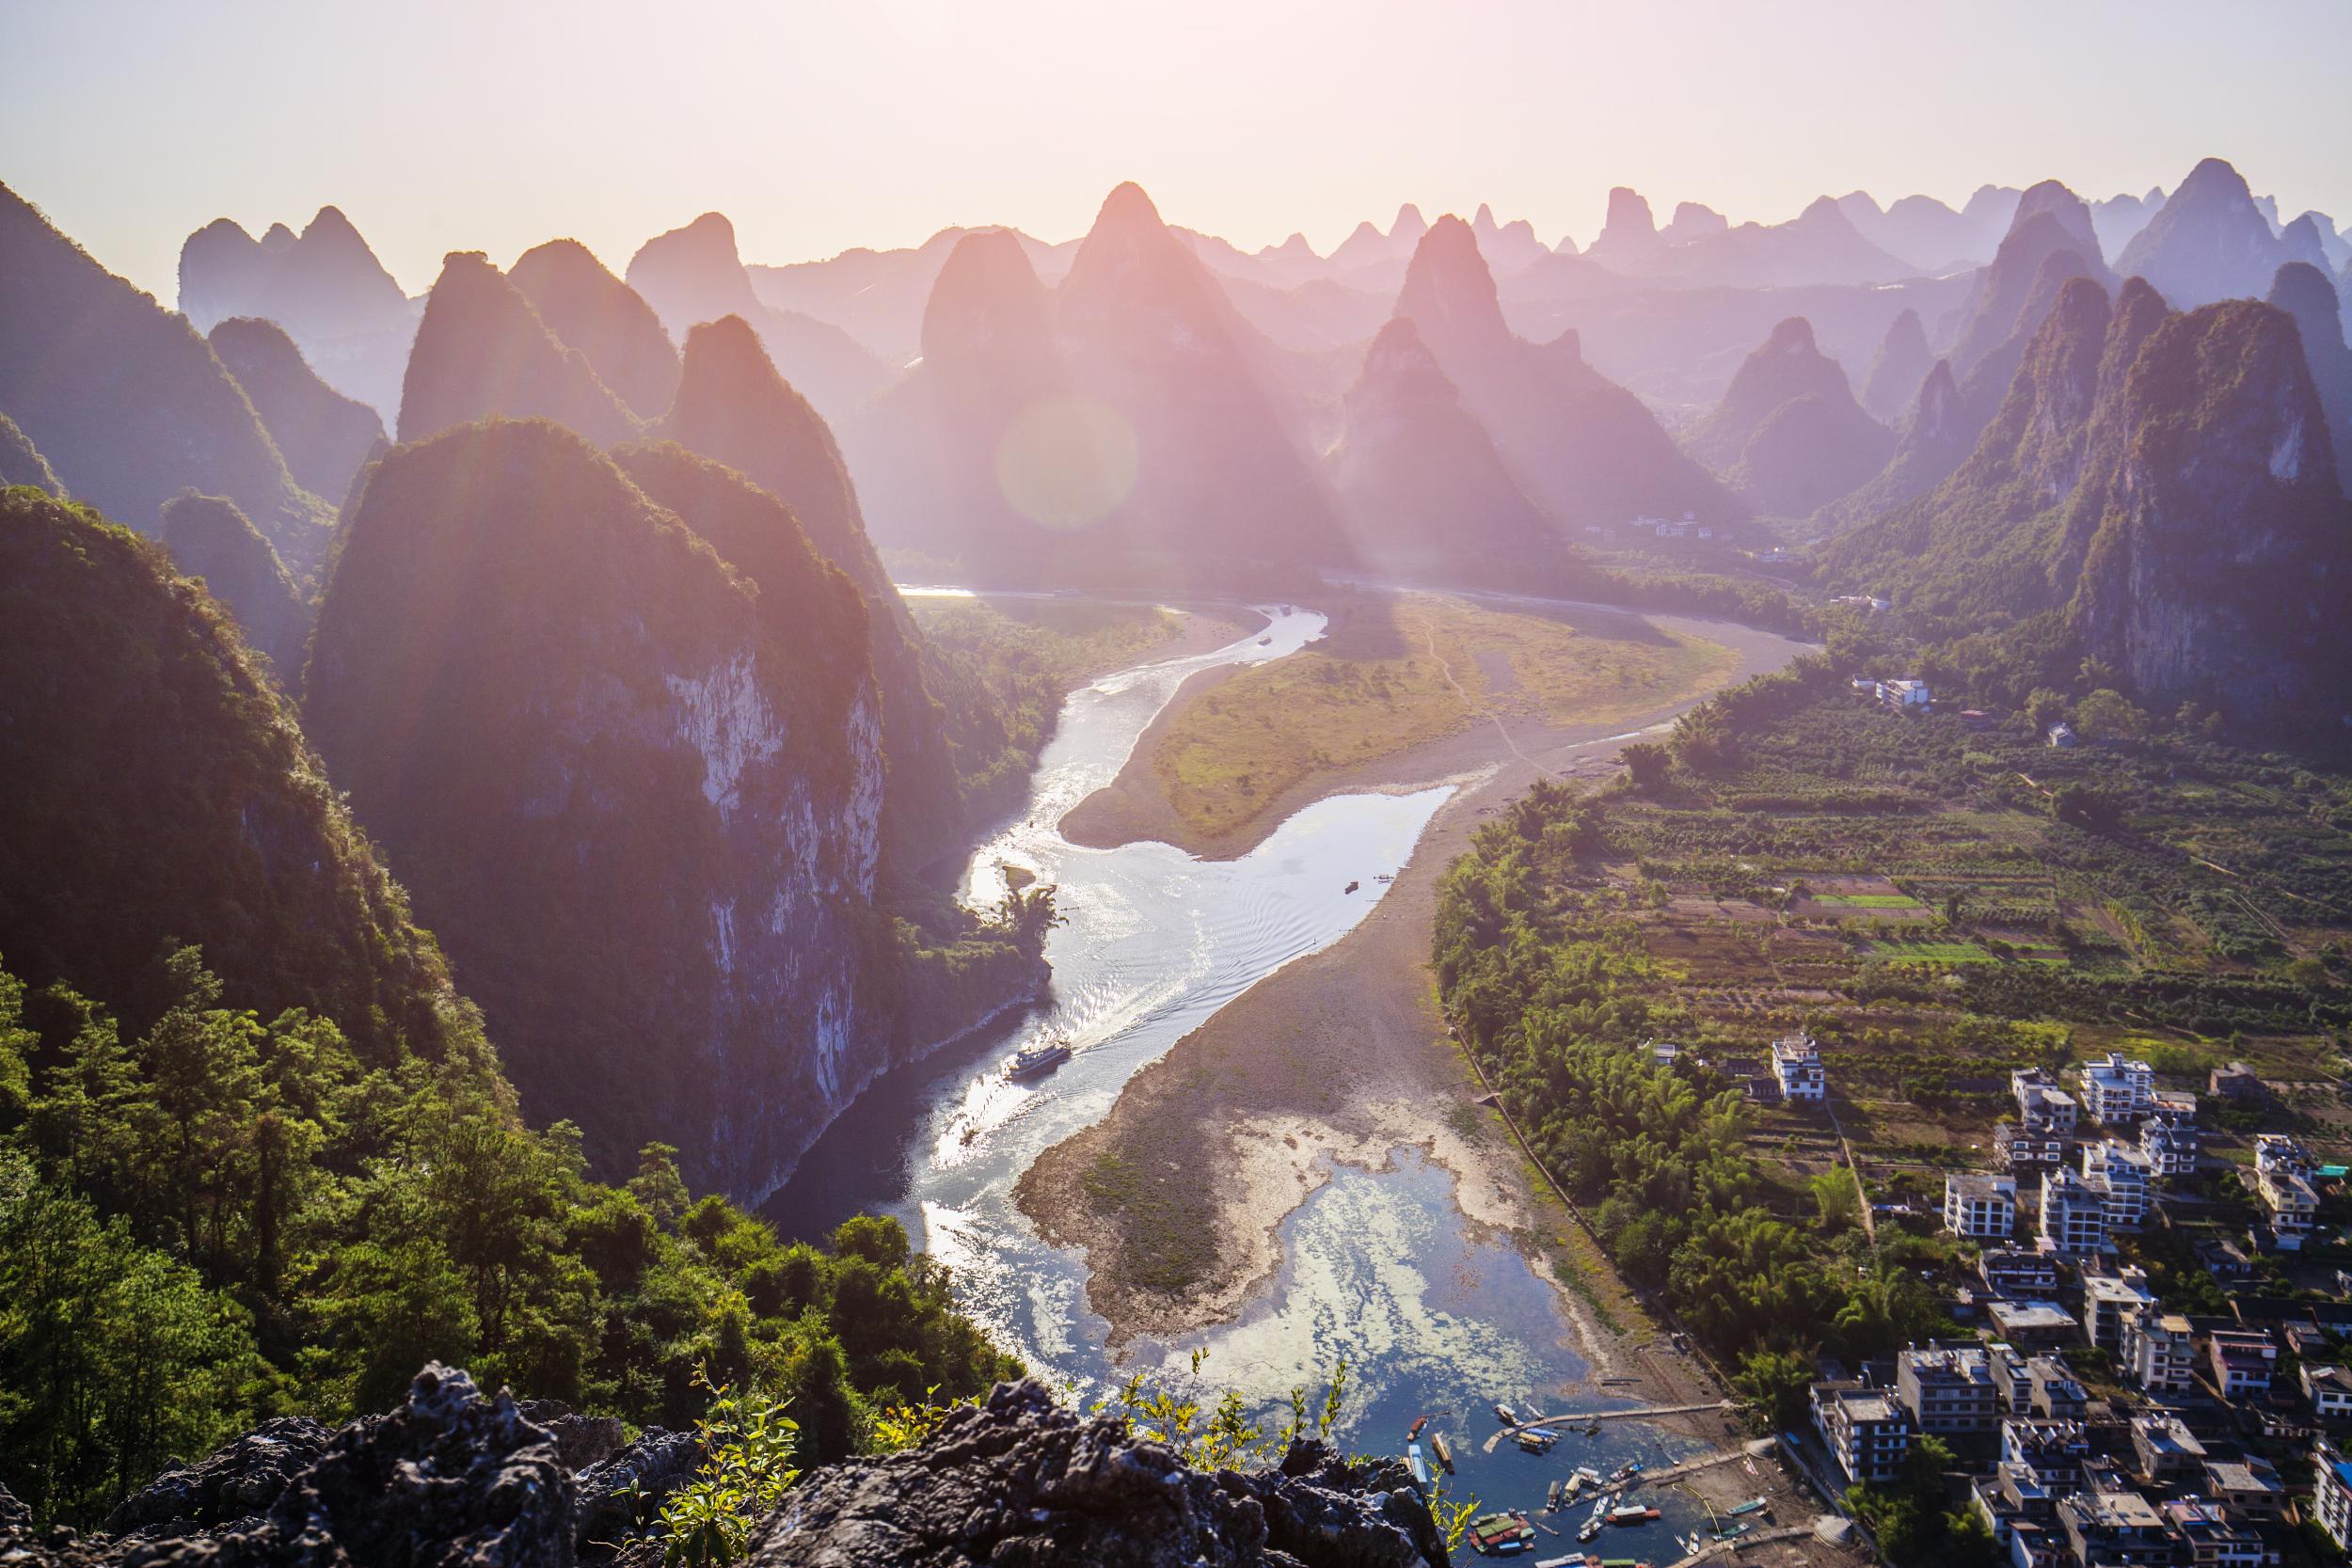 Minjiang River Gudong Scenic Area